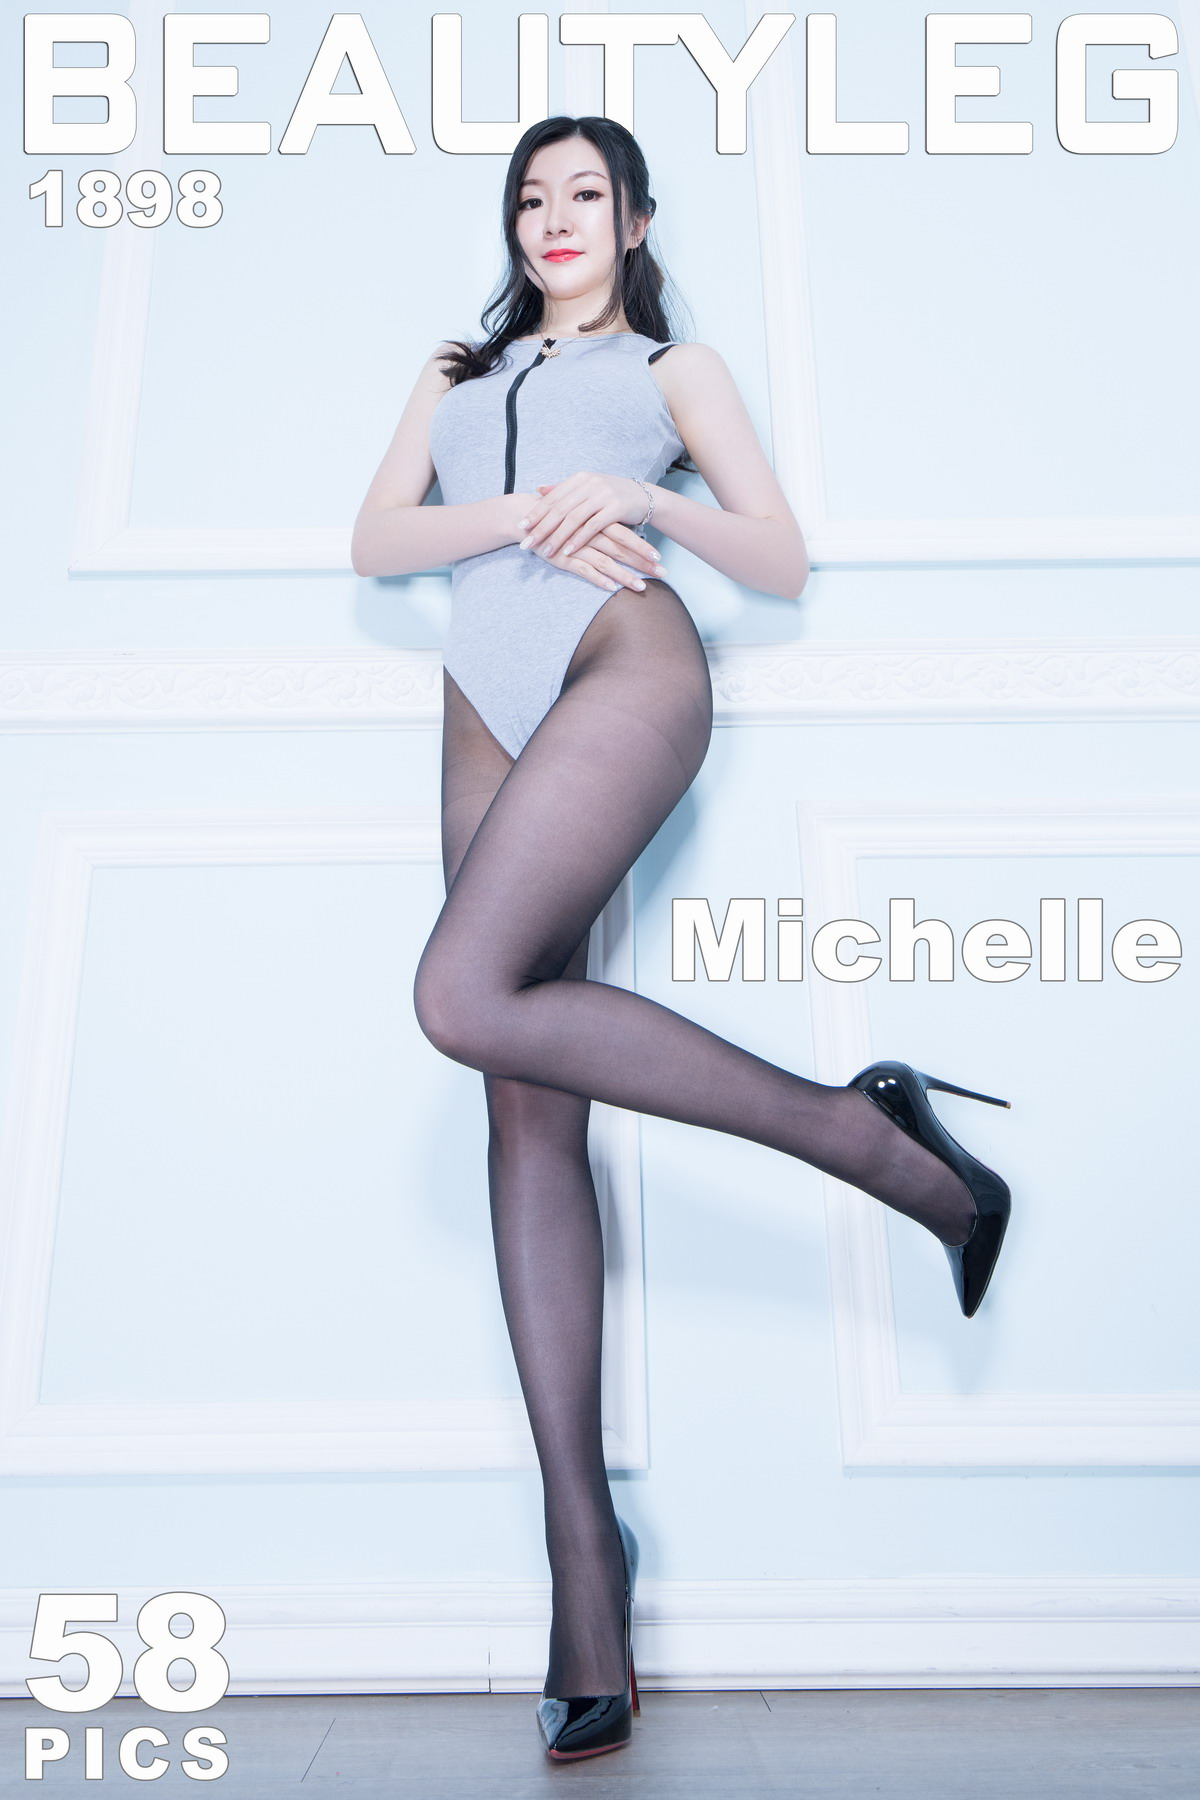 [Beautyleg]美腿写真 2020.03.23 No.1898 Michelle[/455M]